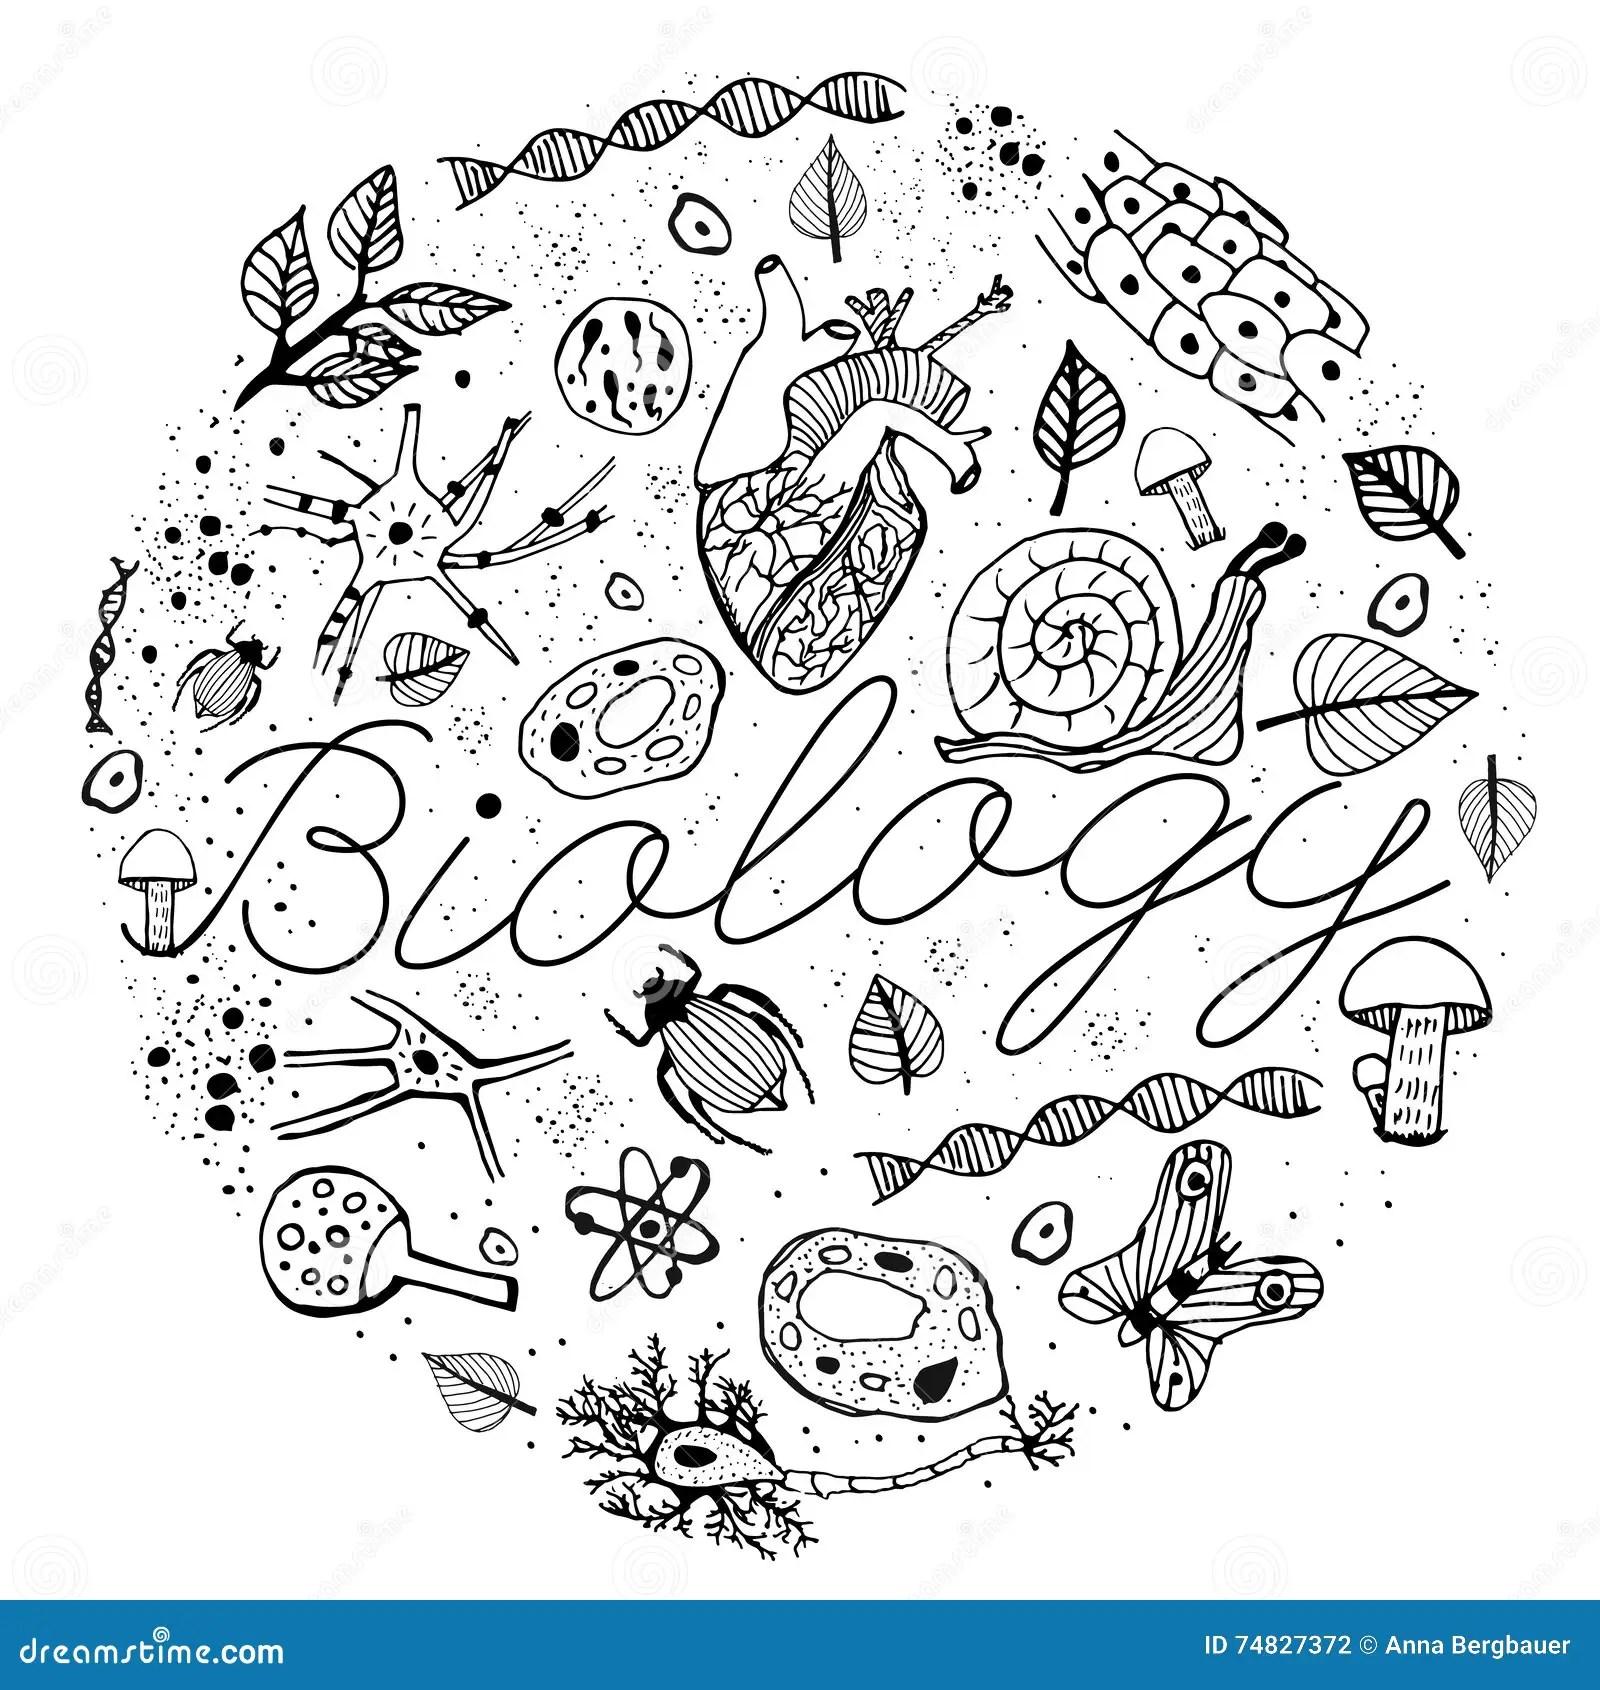 Biology Vector Doodles Stock Vector Illustration Of